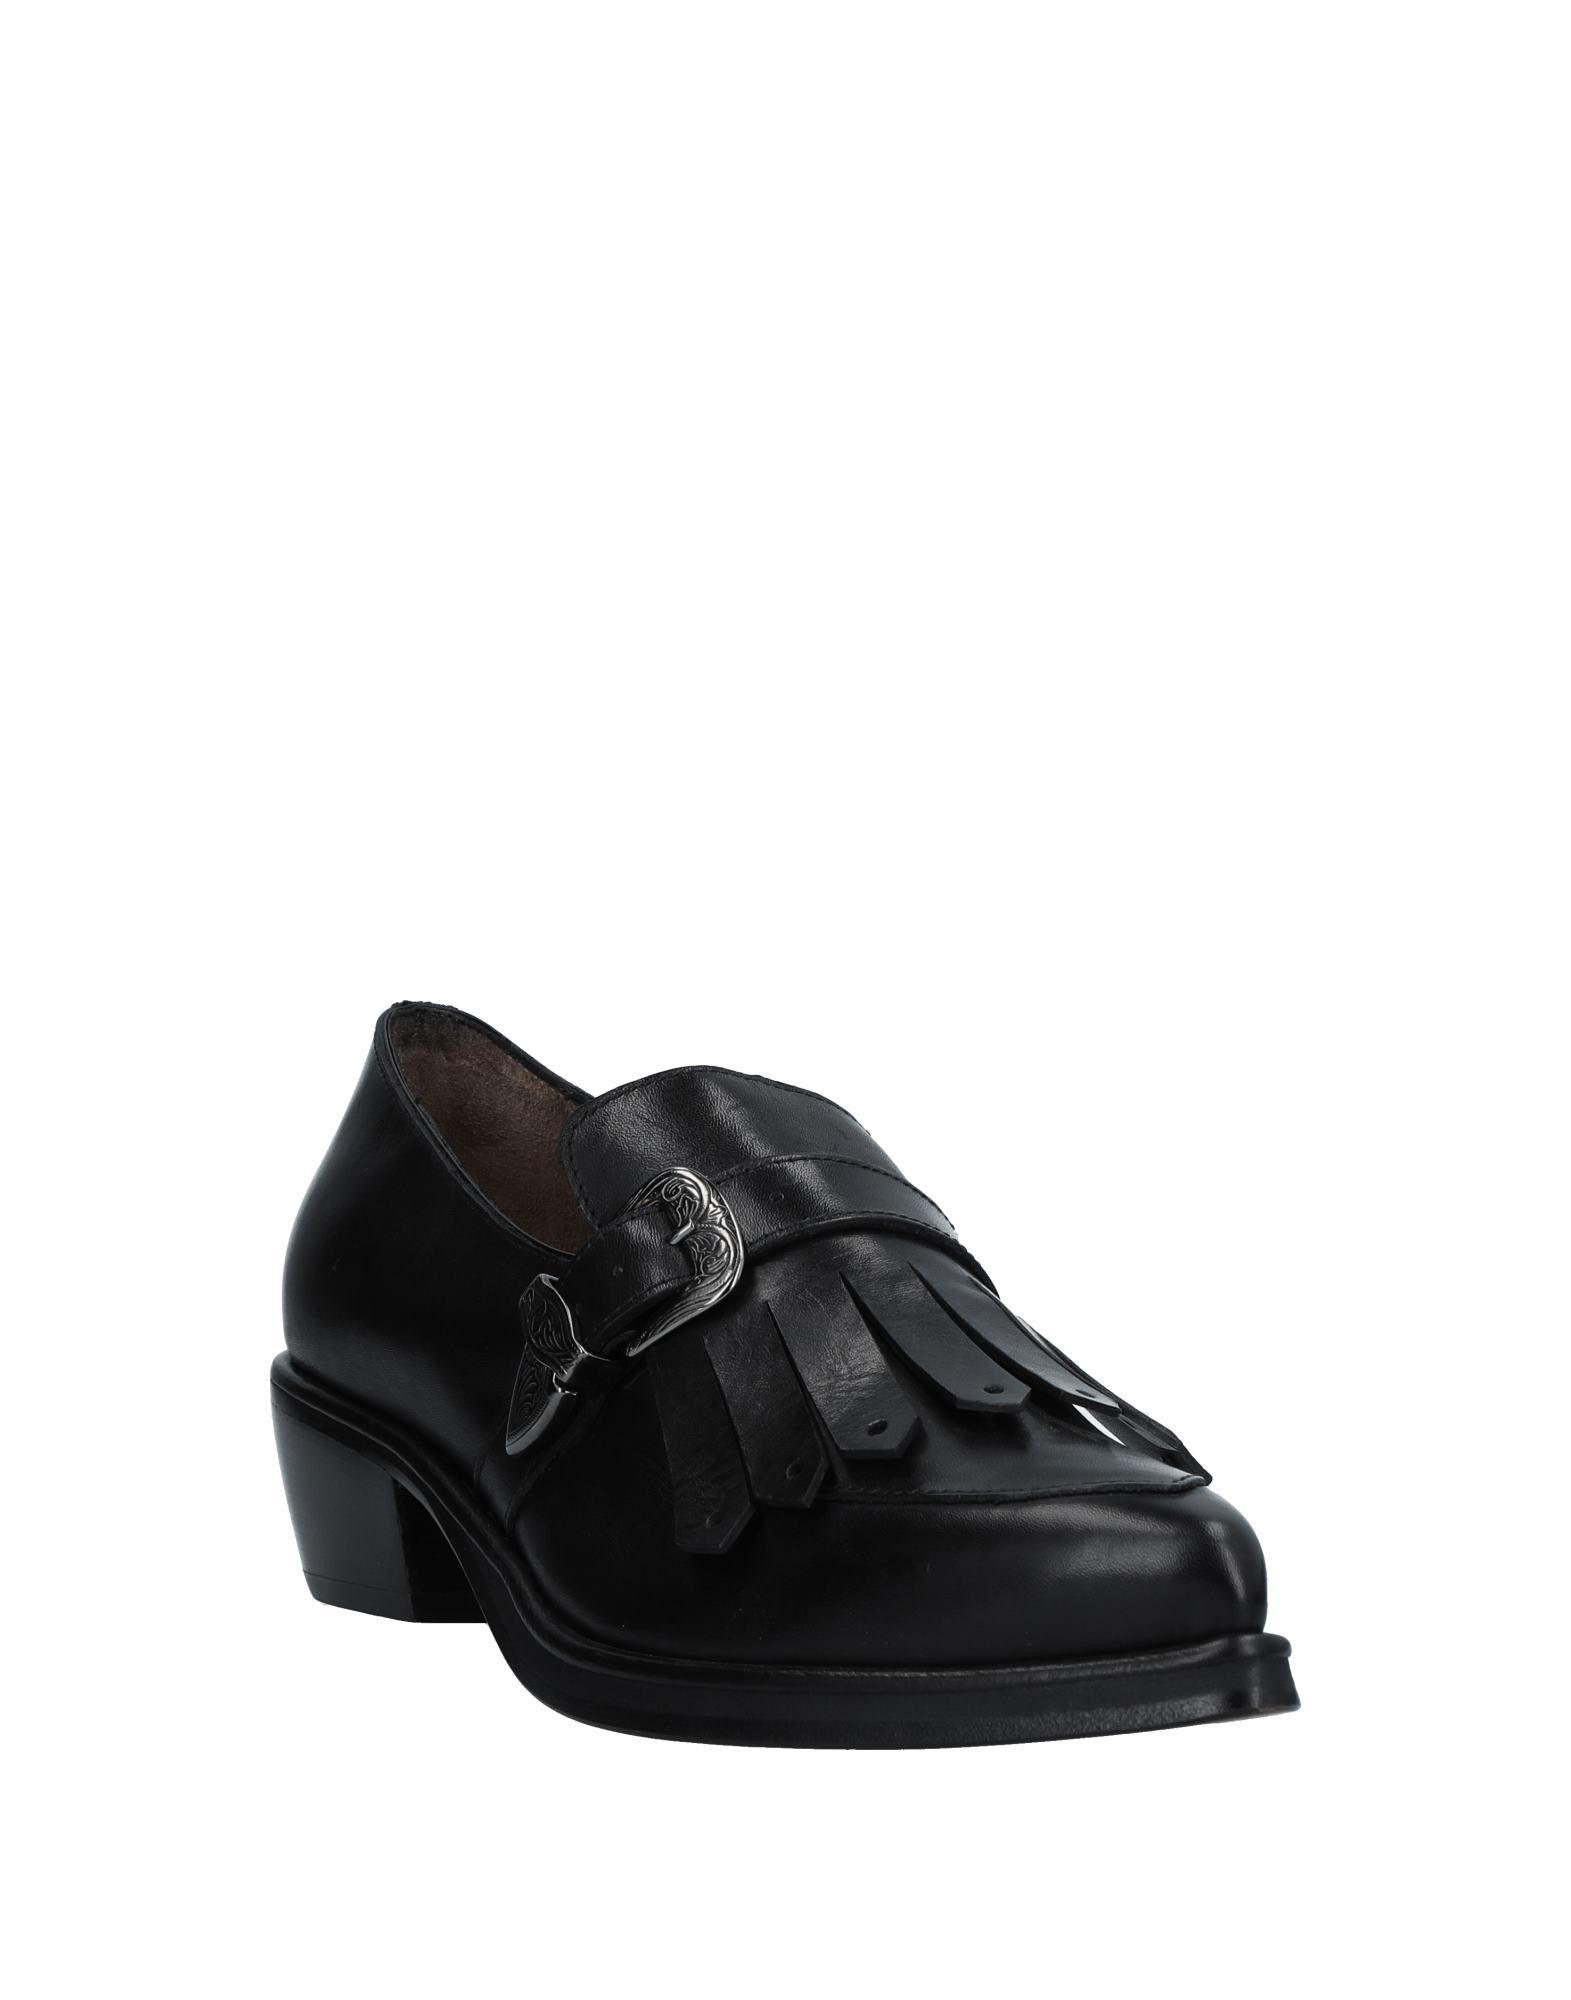 Stilvolle Mokassins billige Schuhe Lena Milos Mokassins Stilvolle Damen  11524955QI fa6f34